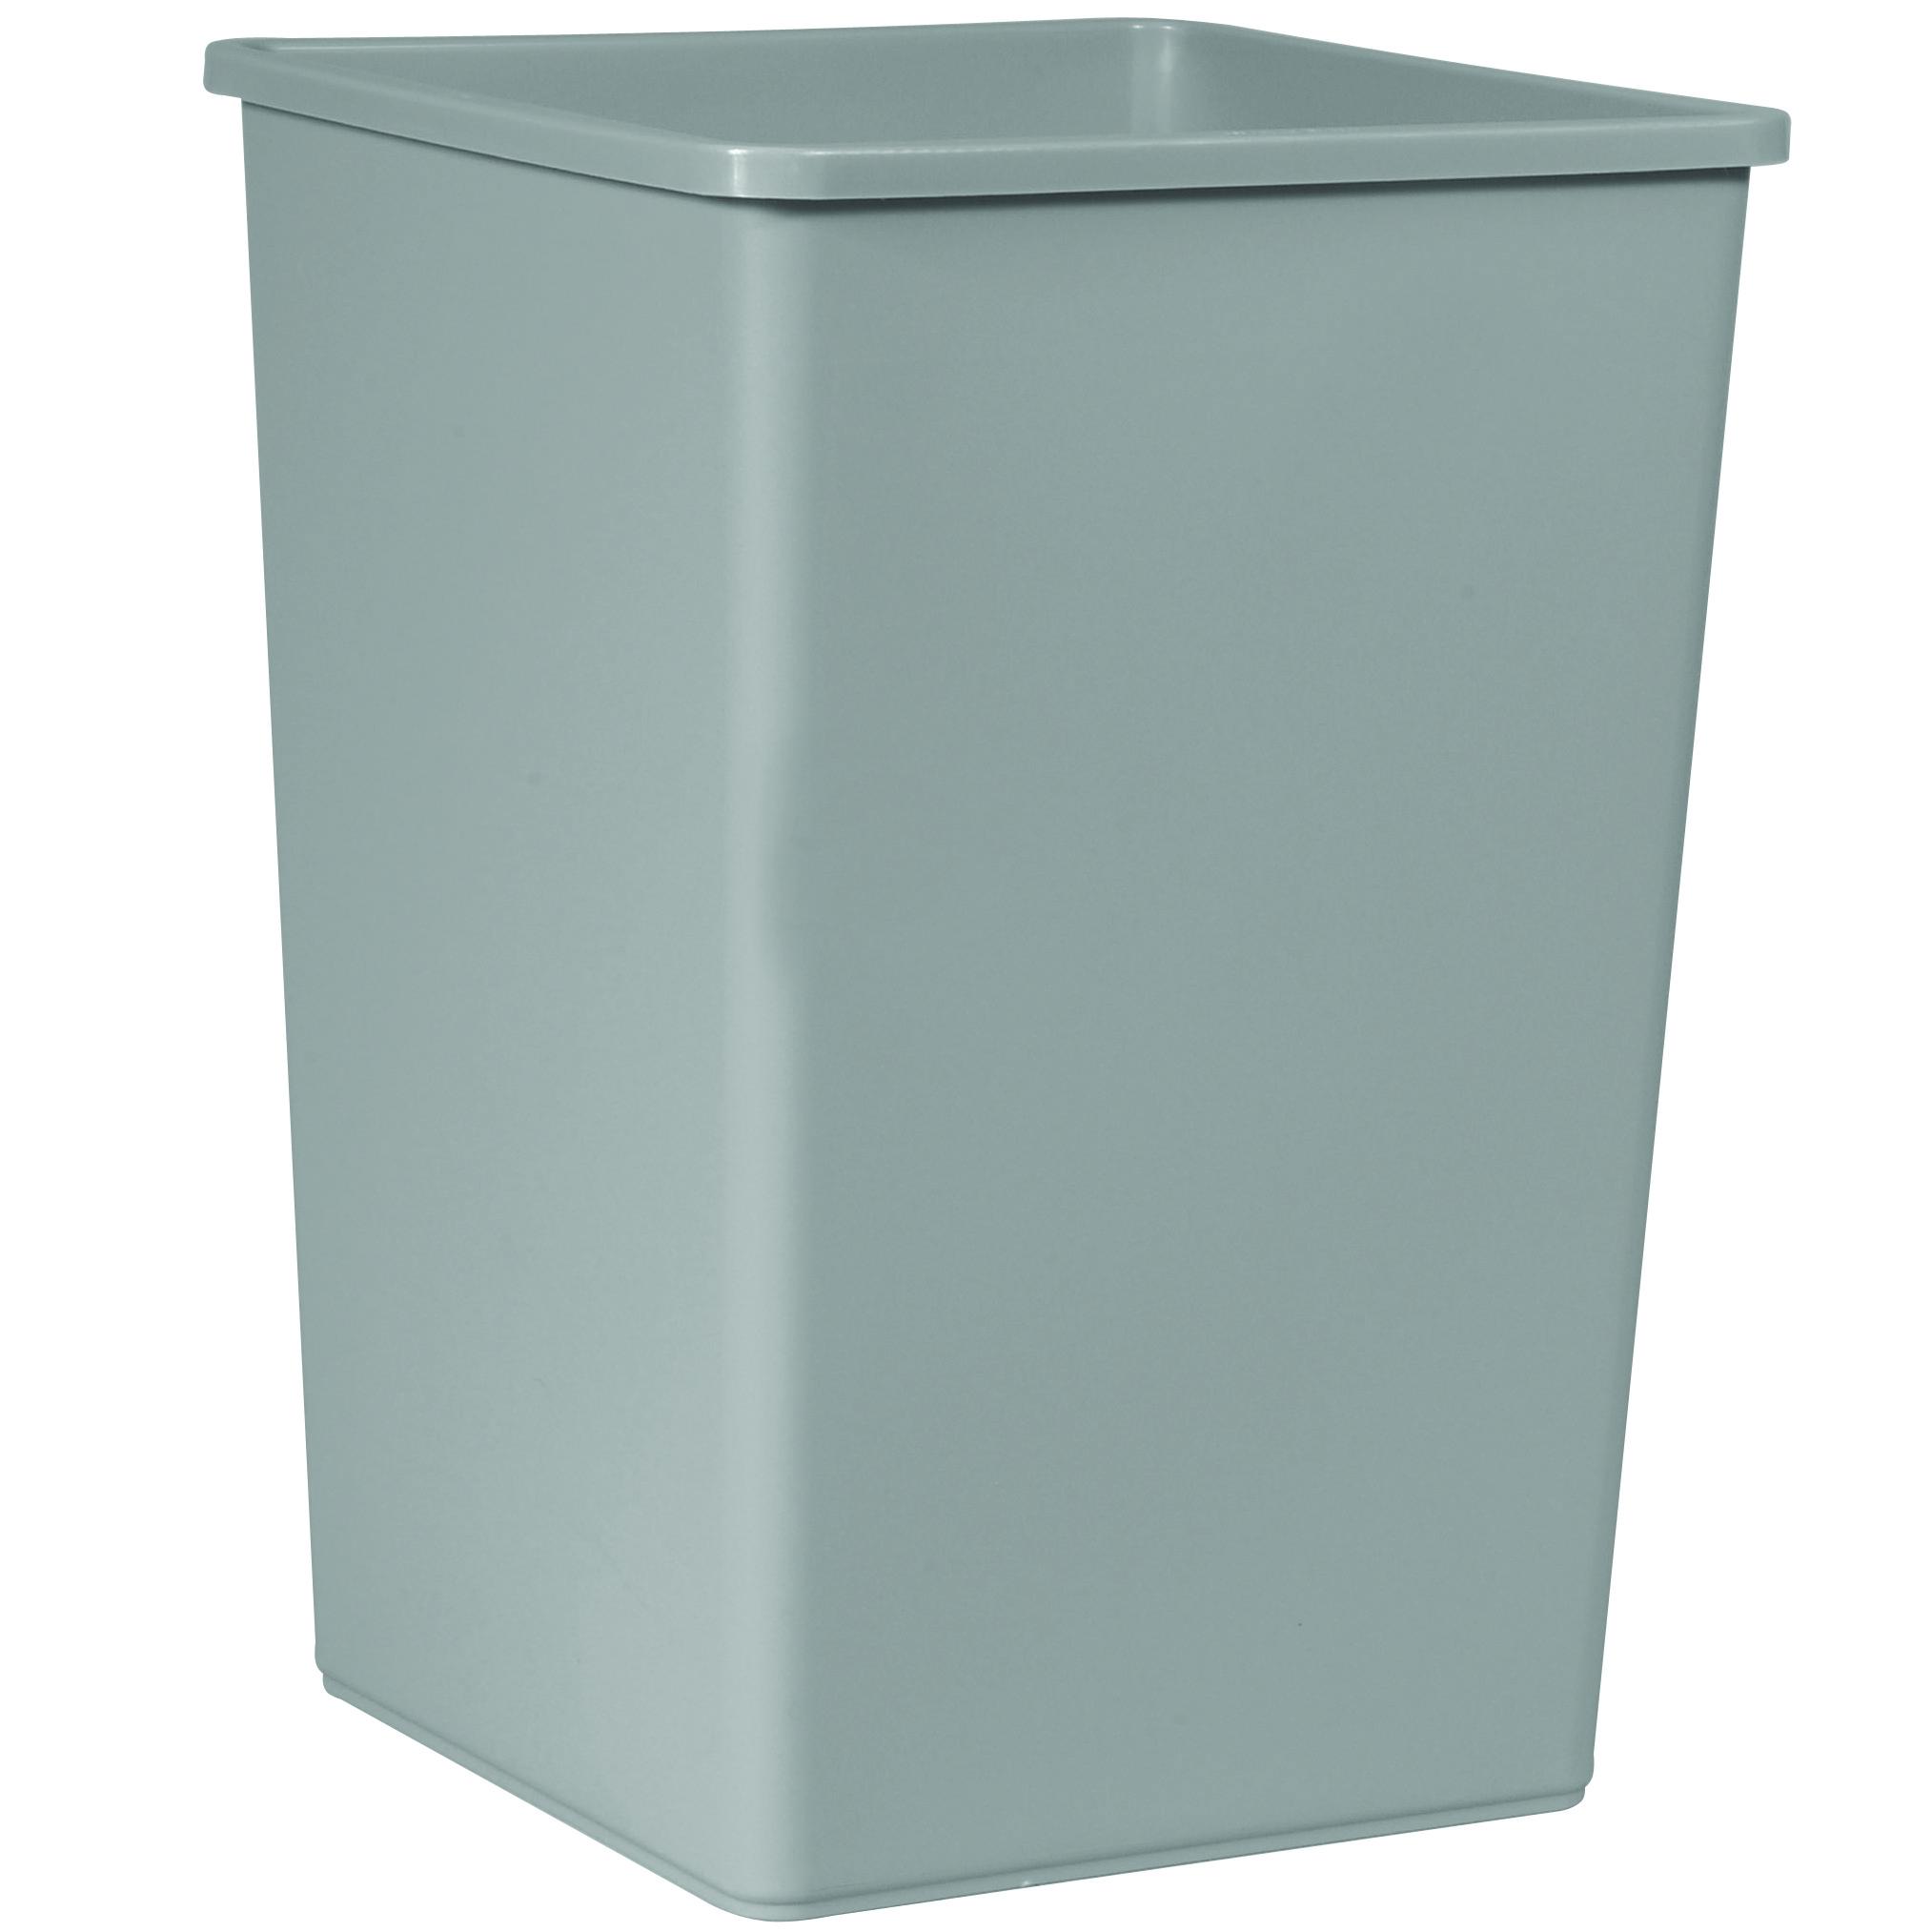 35 Gallon Rubbermaid Untouchable Square Trash Can Grey Beige